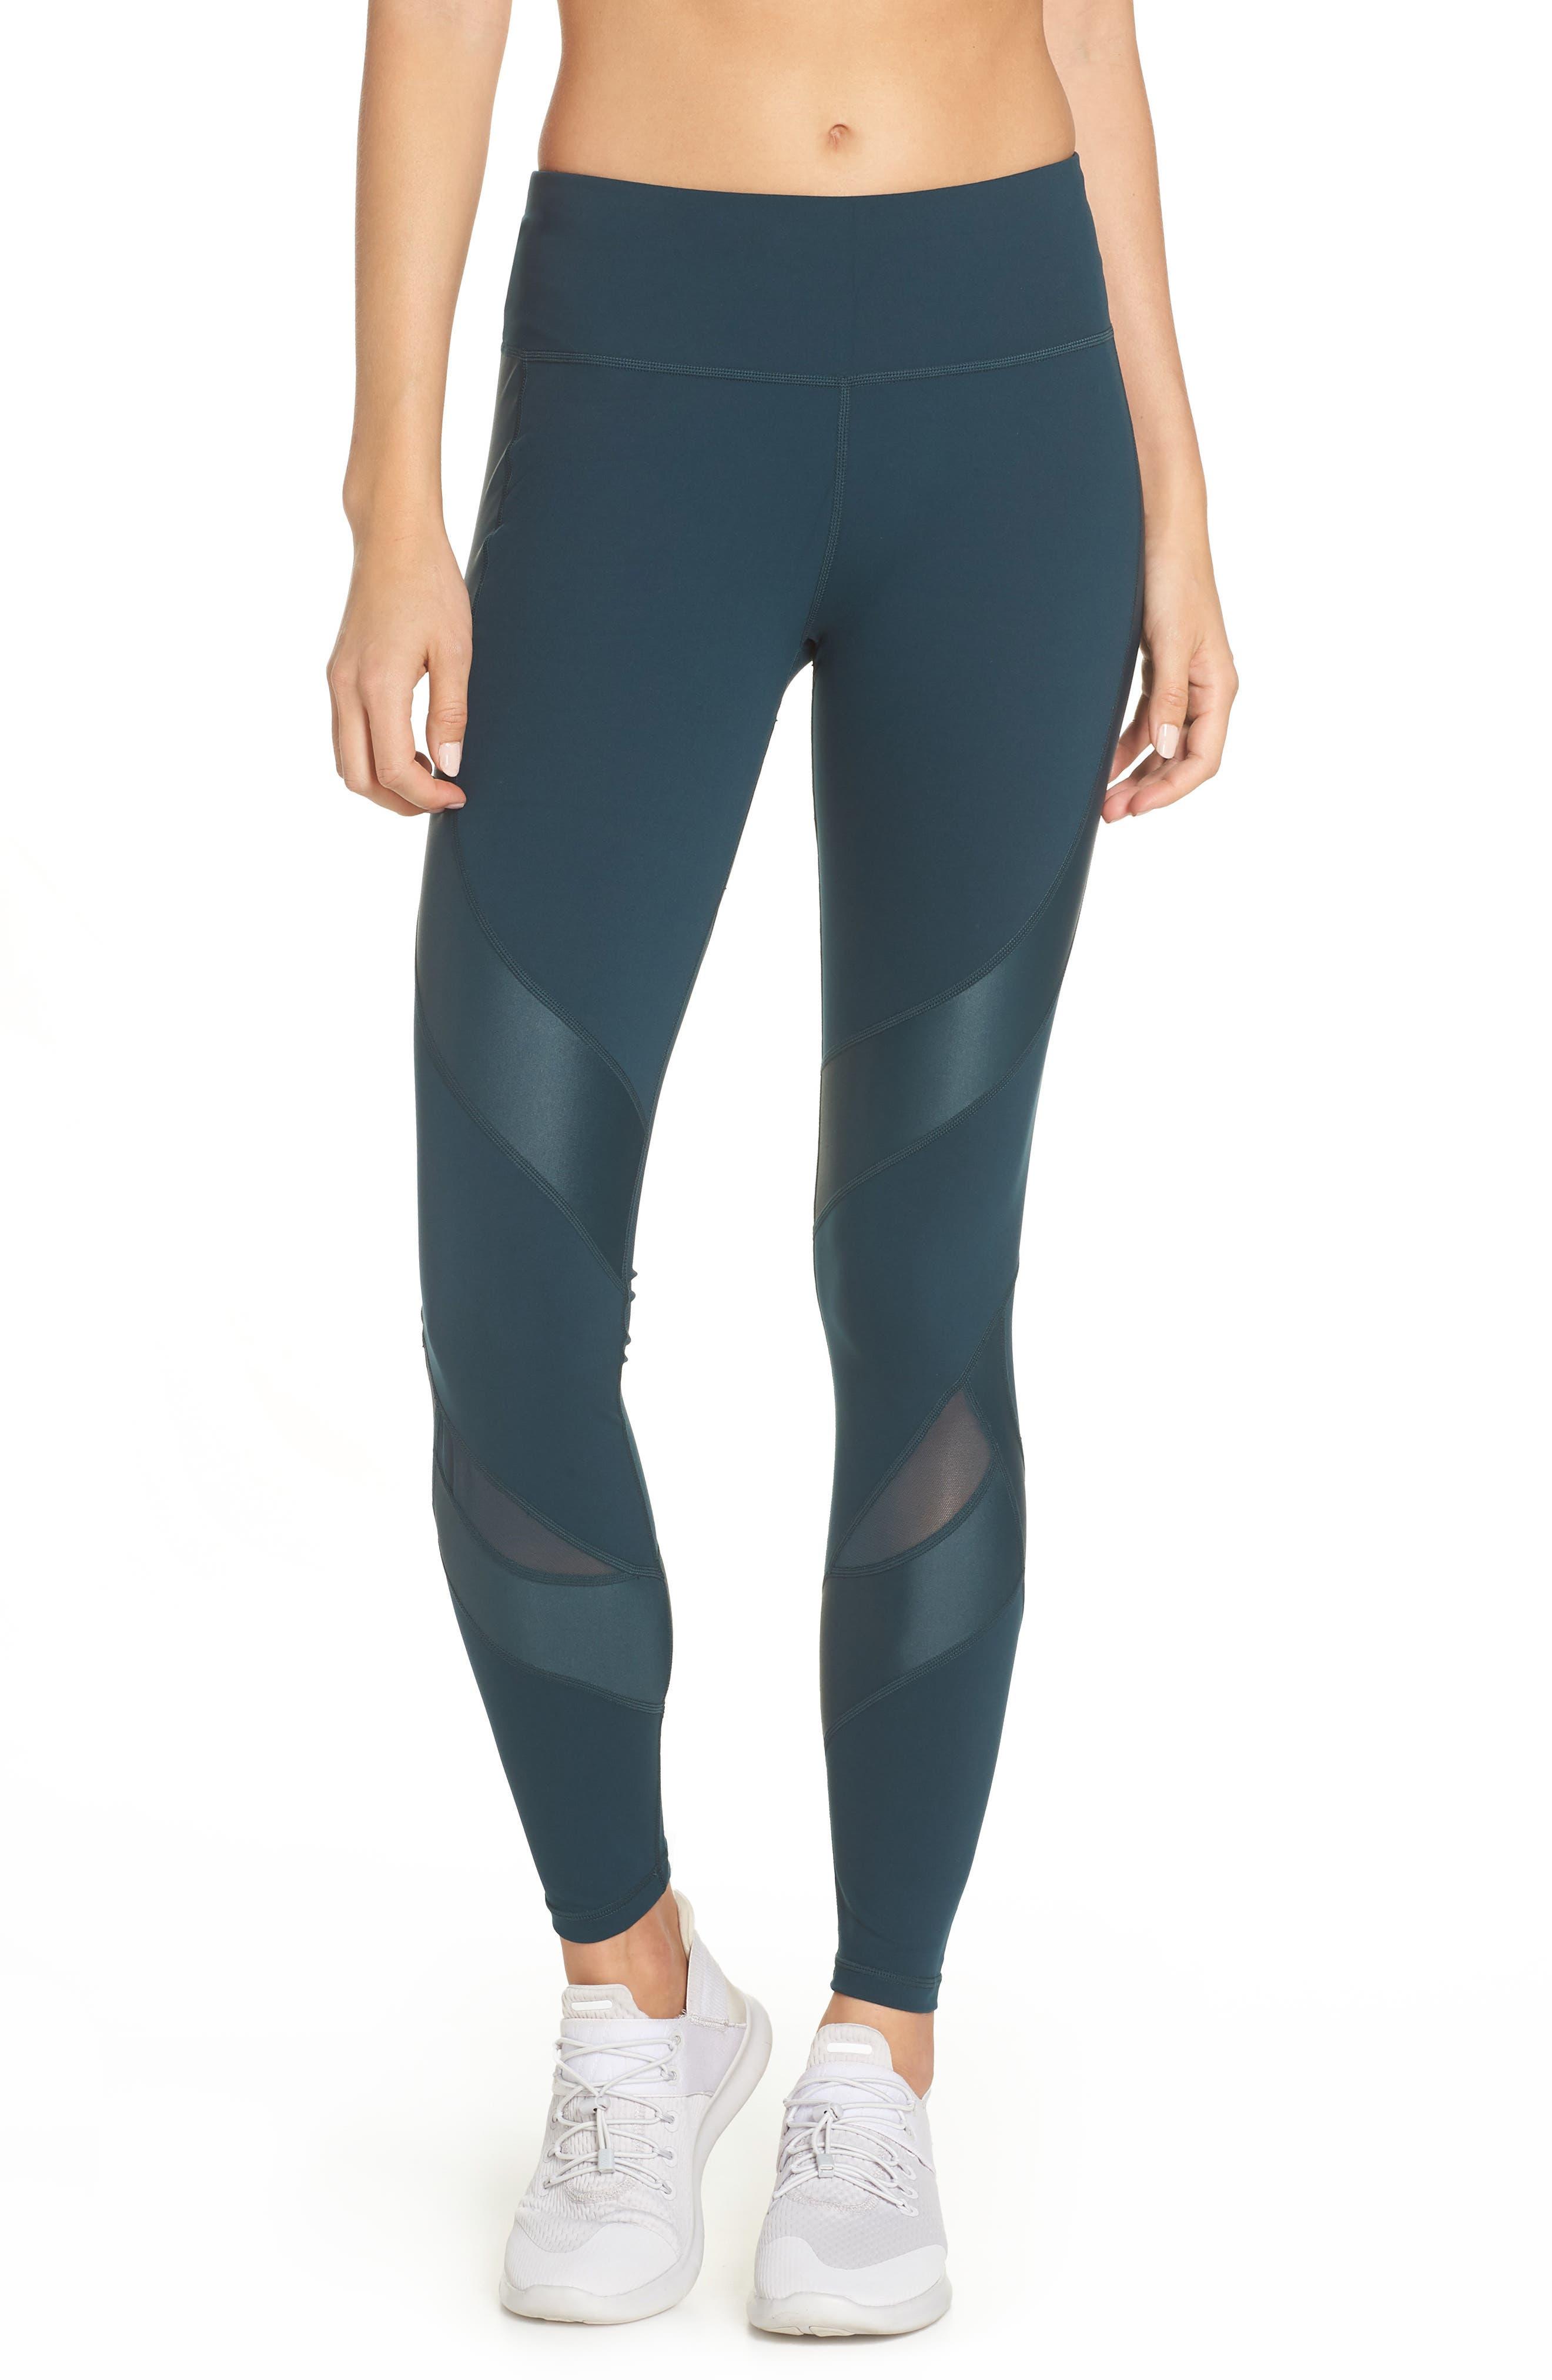 Power Wetlook Mesh Workout Leggings,                         Main,                         color, MIDNIGHT TEAL